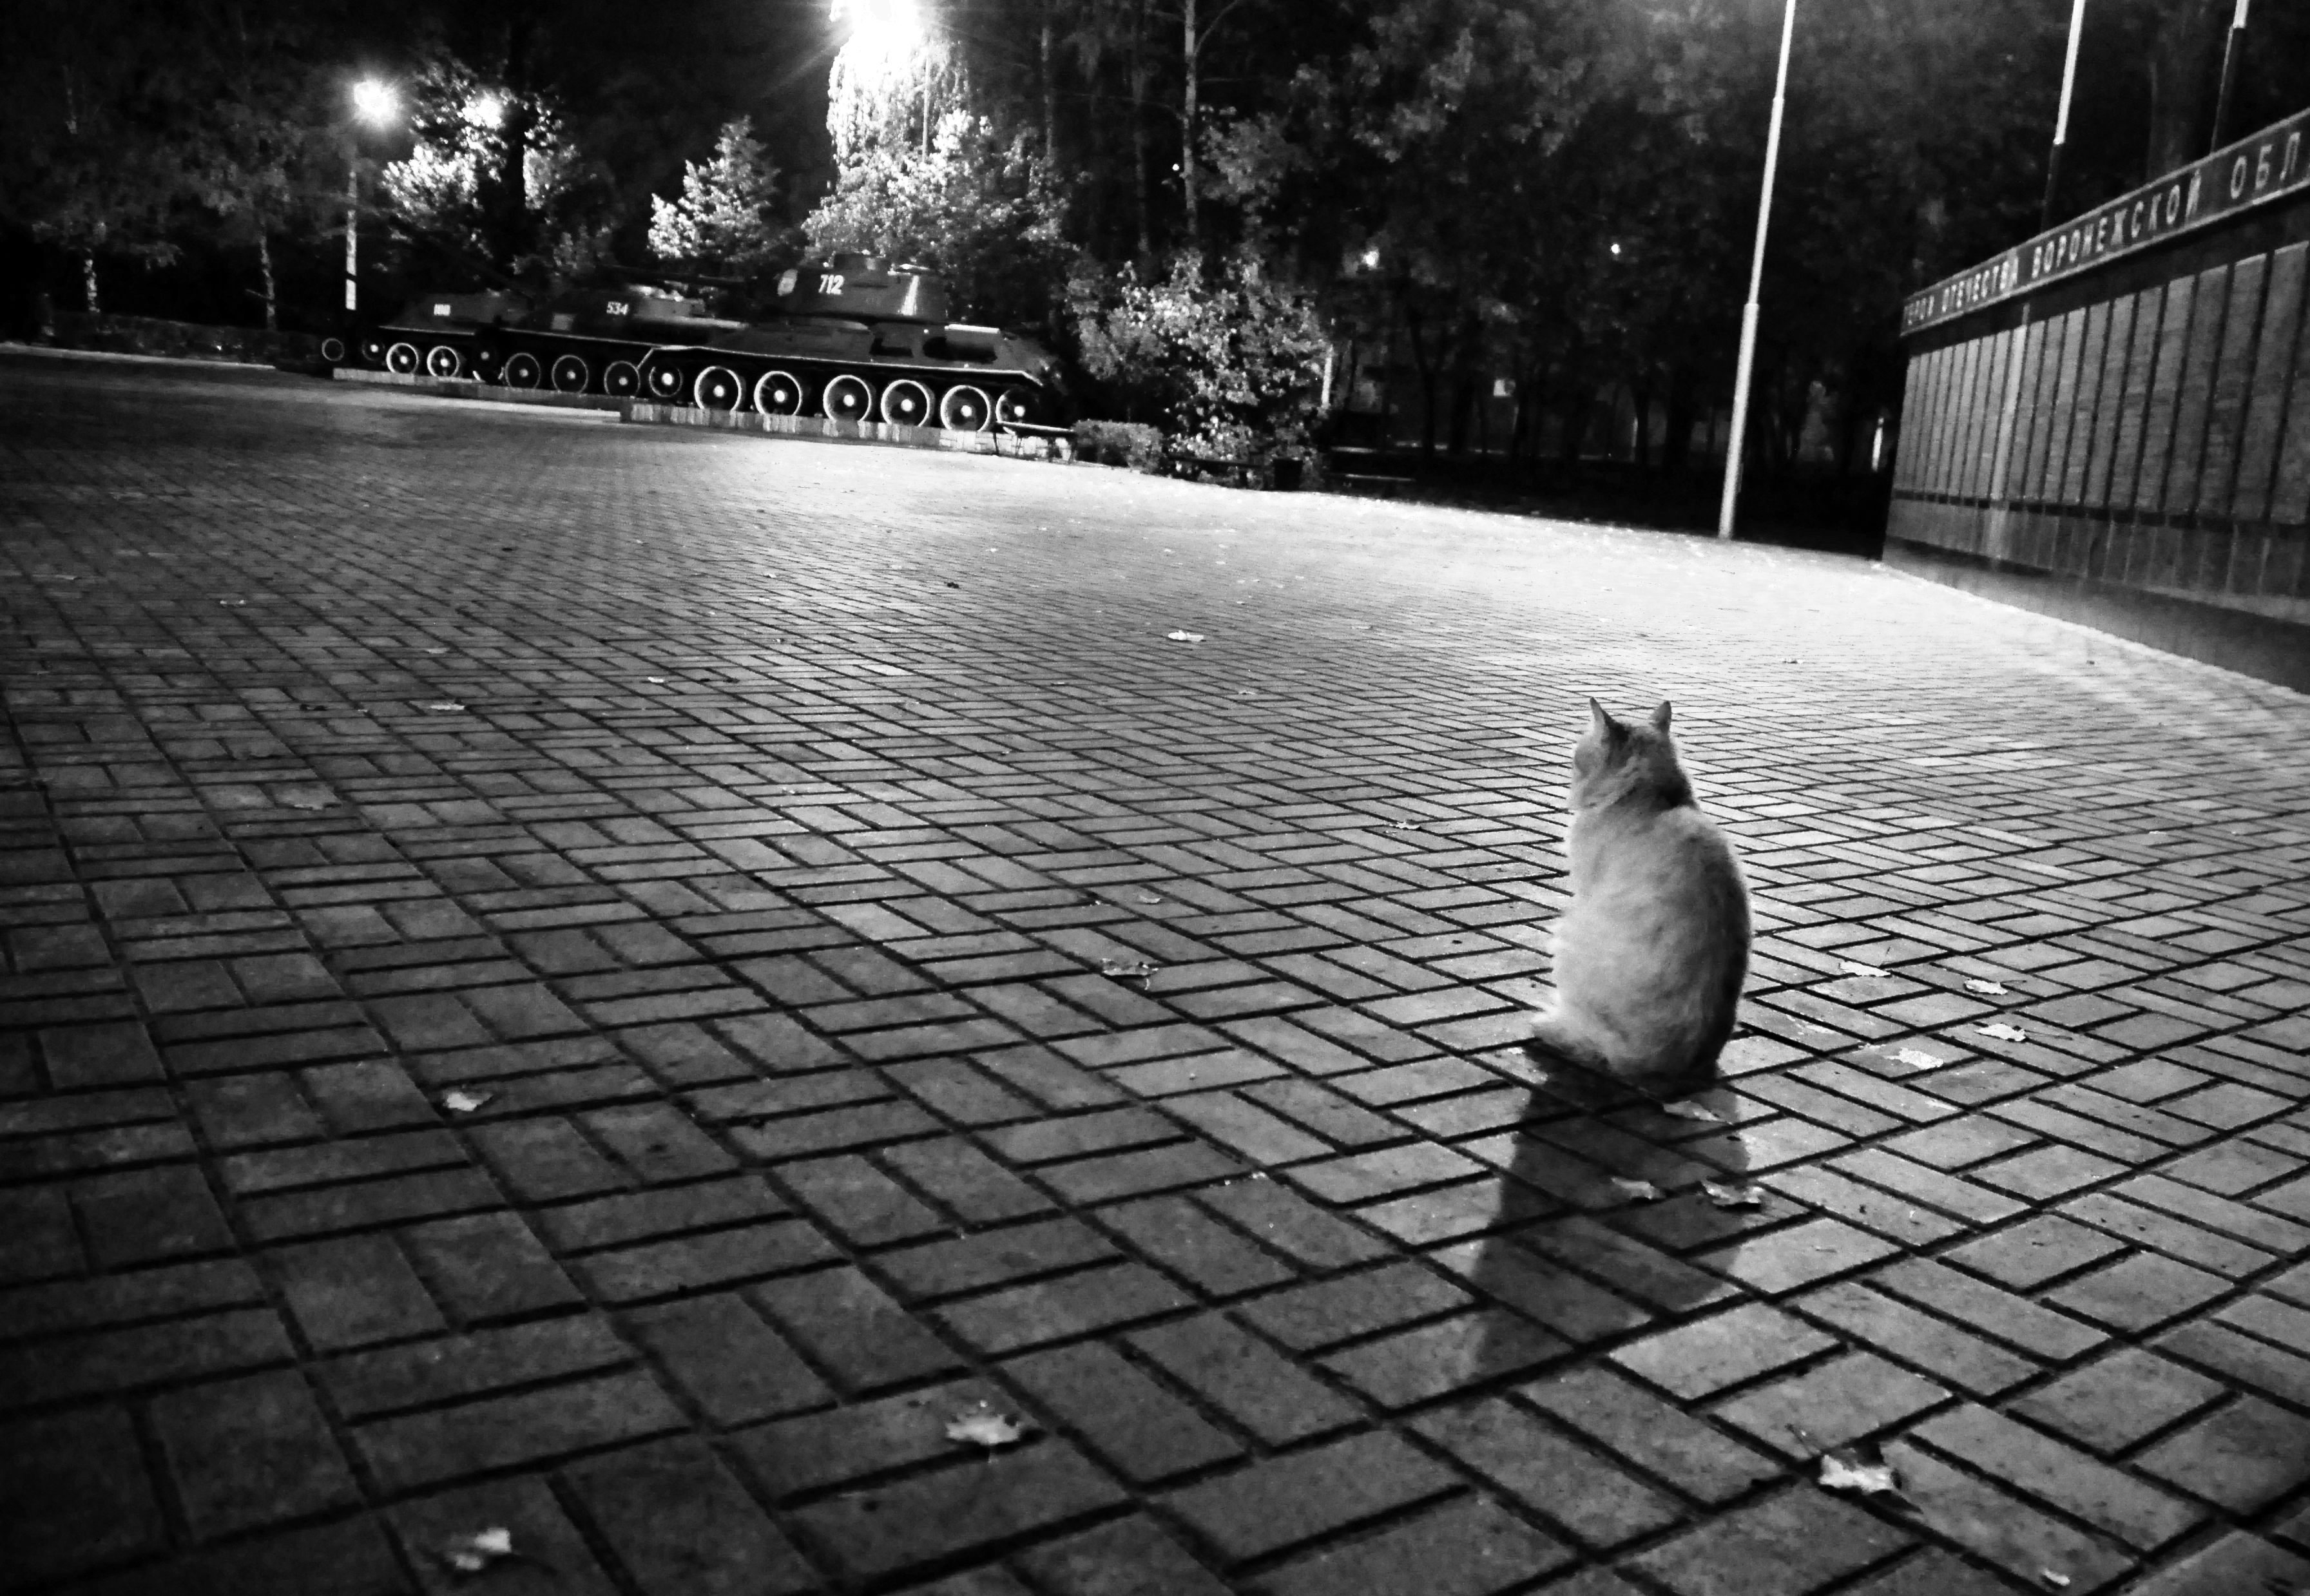 yalnız kedi